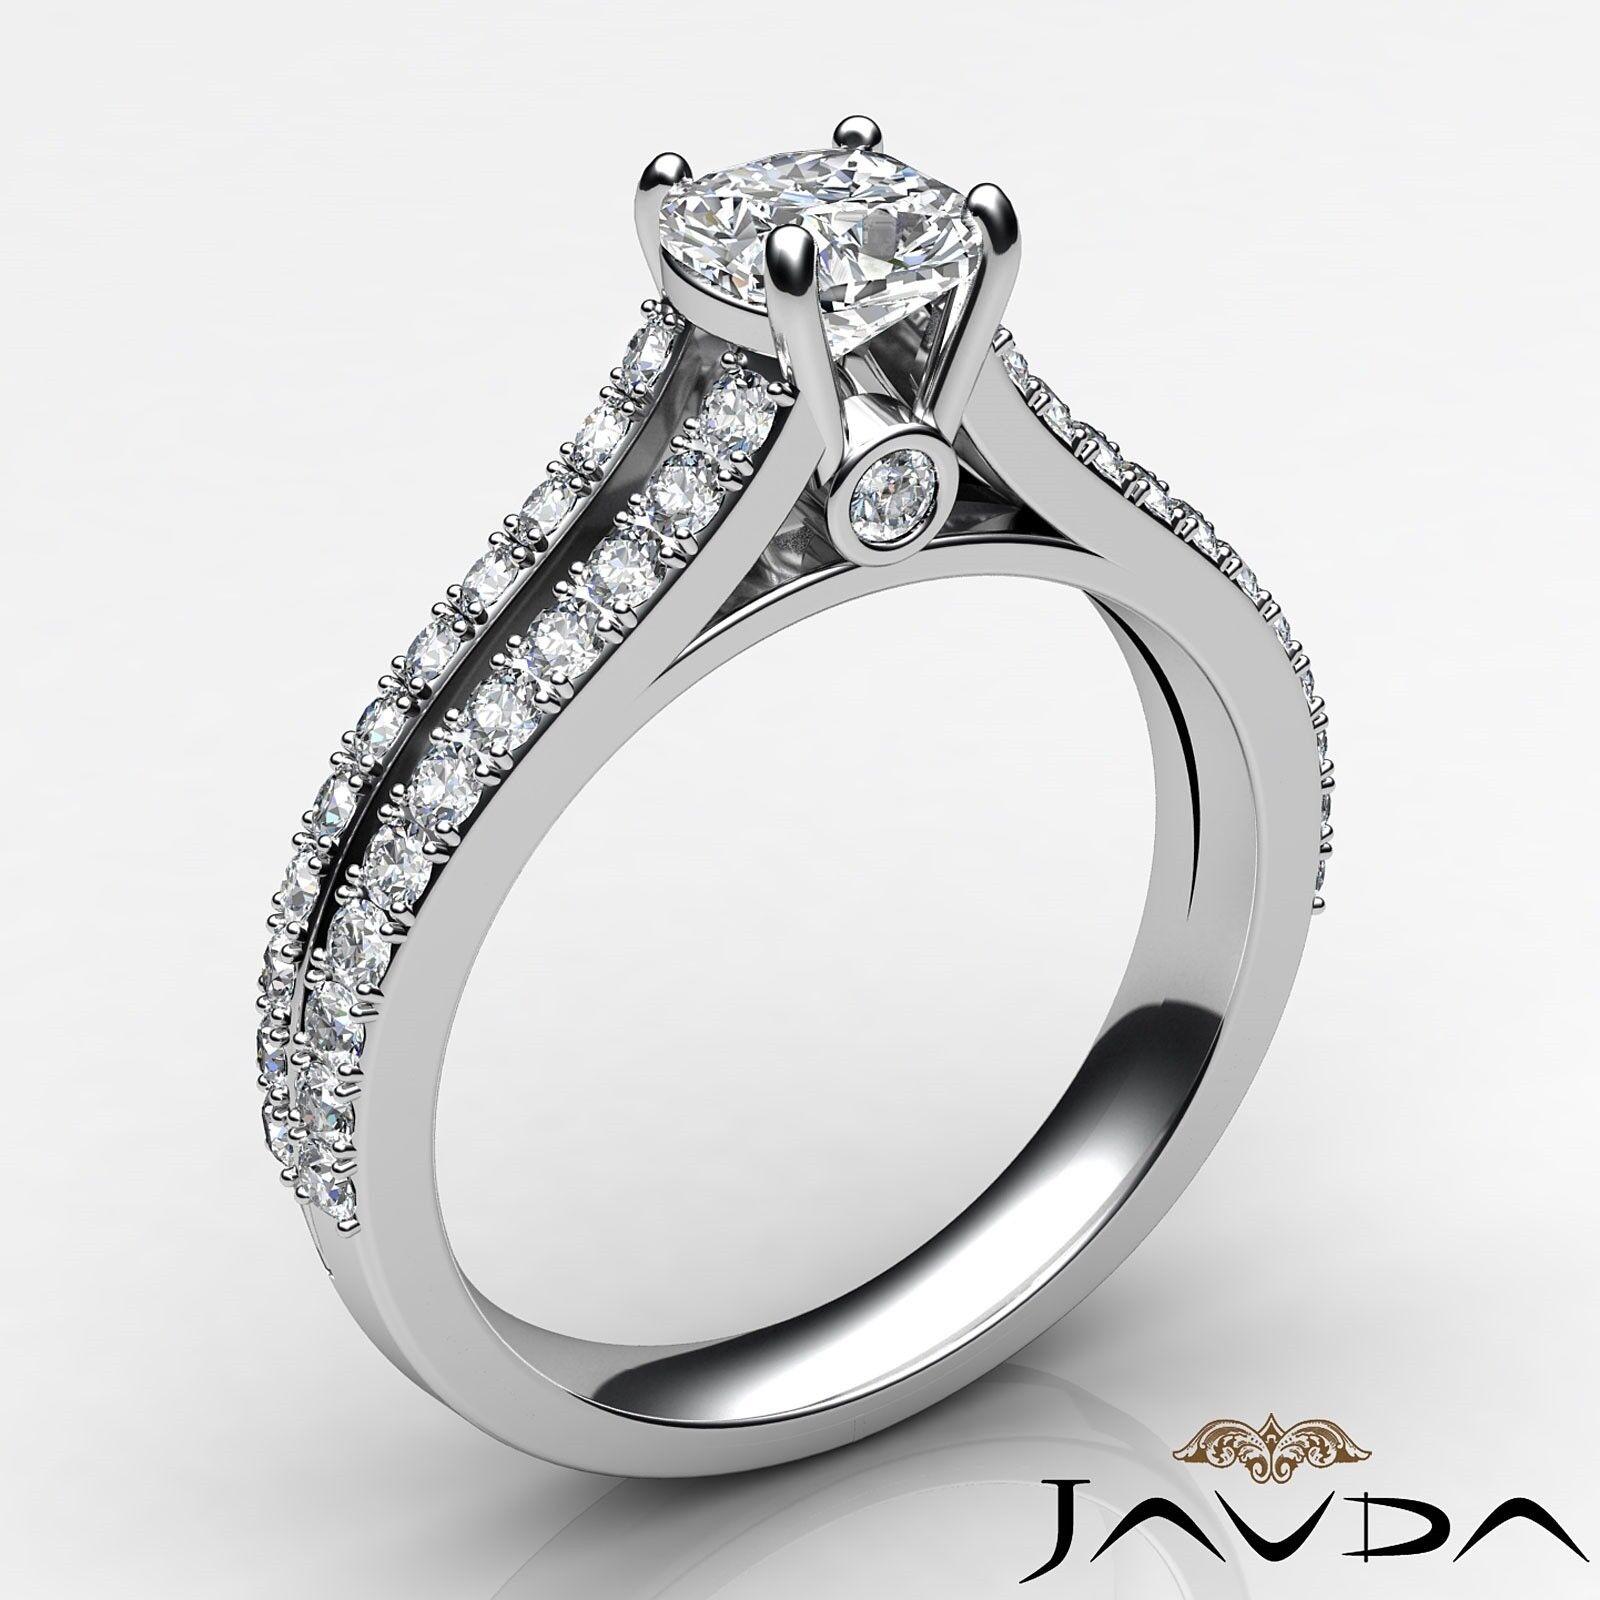 1.29ctw Double Prong Split Shank Cushion Diamond Engagement Ring GIA H-VS2  Gold 1